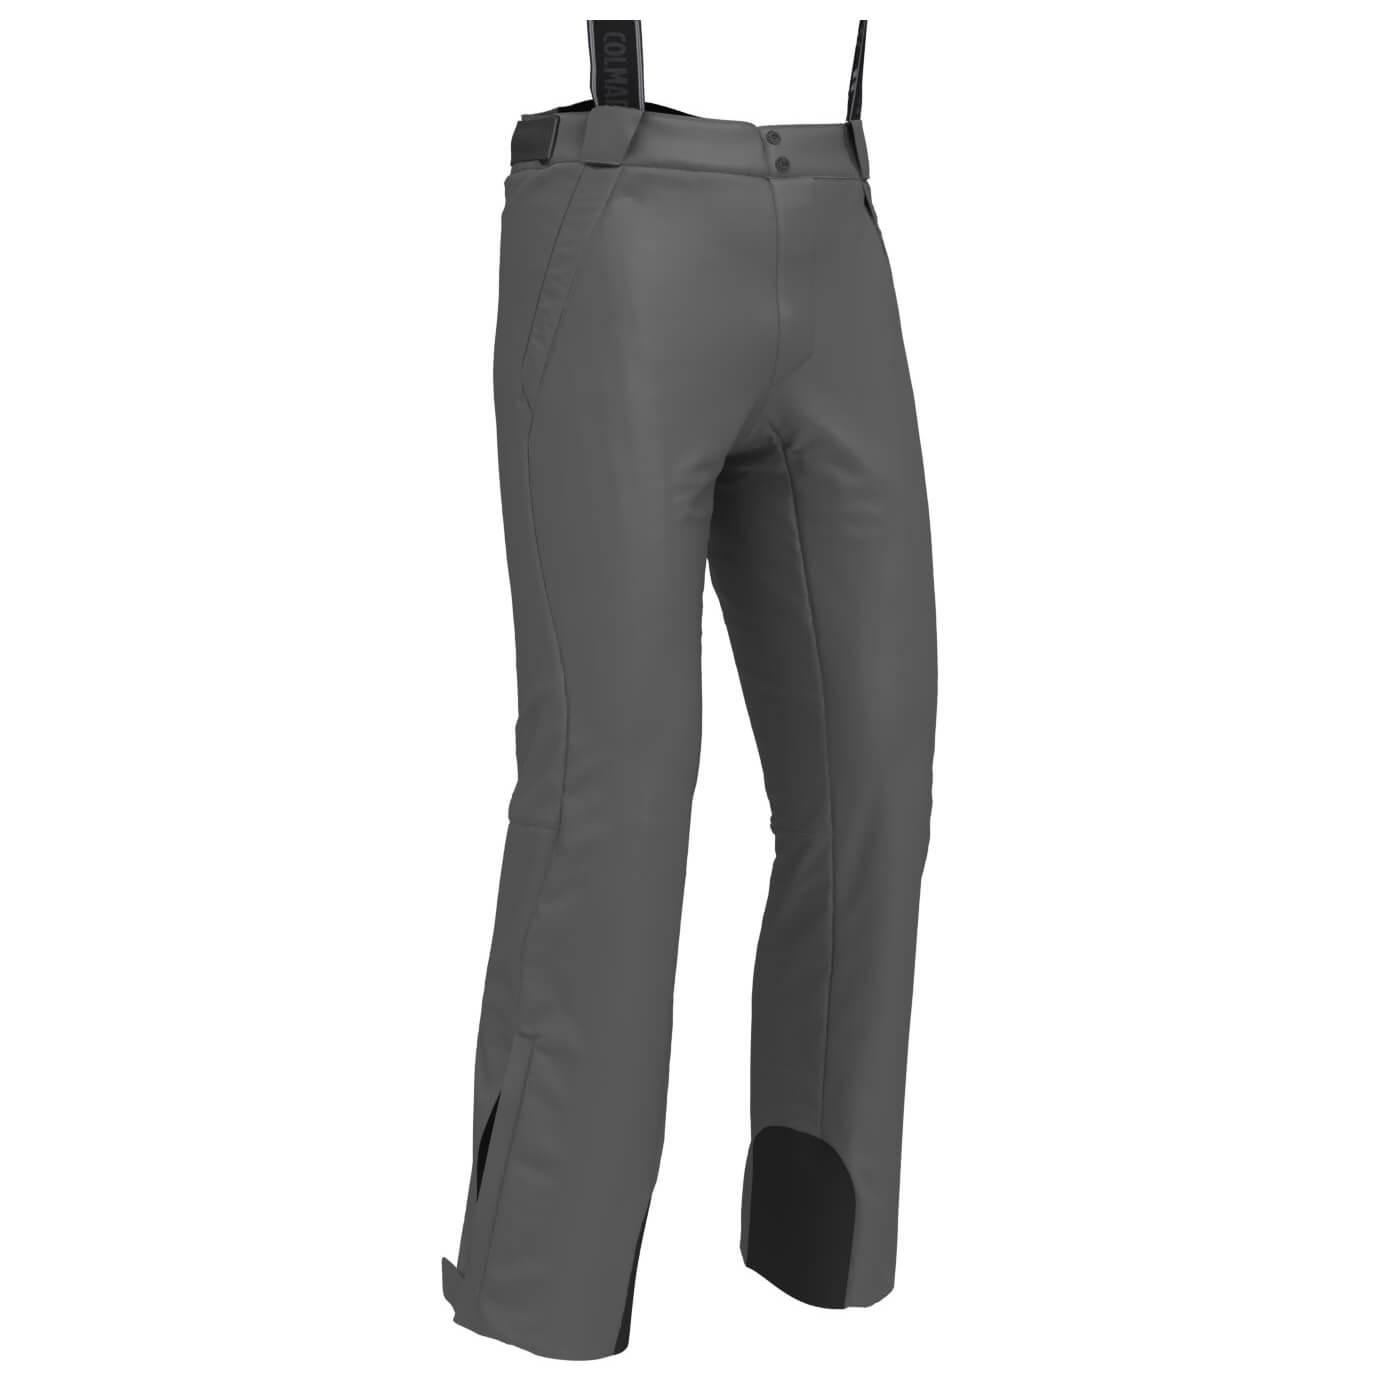 PANTALONES - Pantalones Colmar Spy3oR